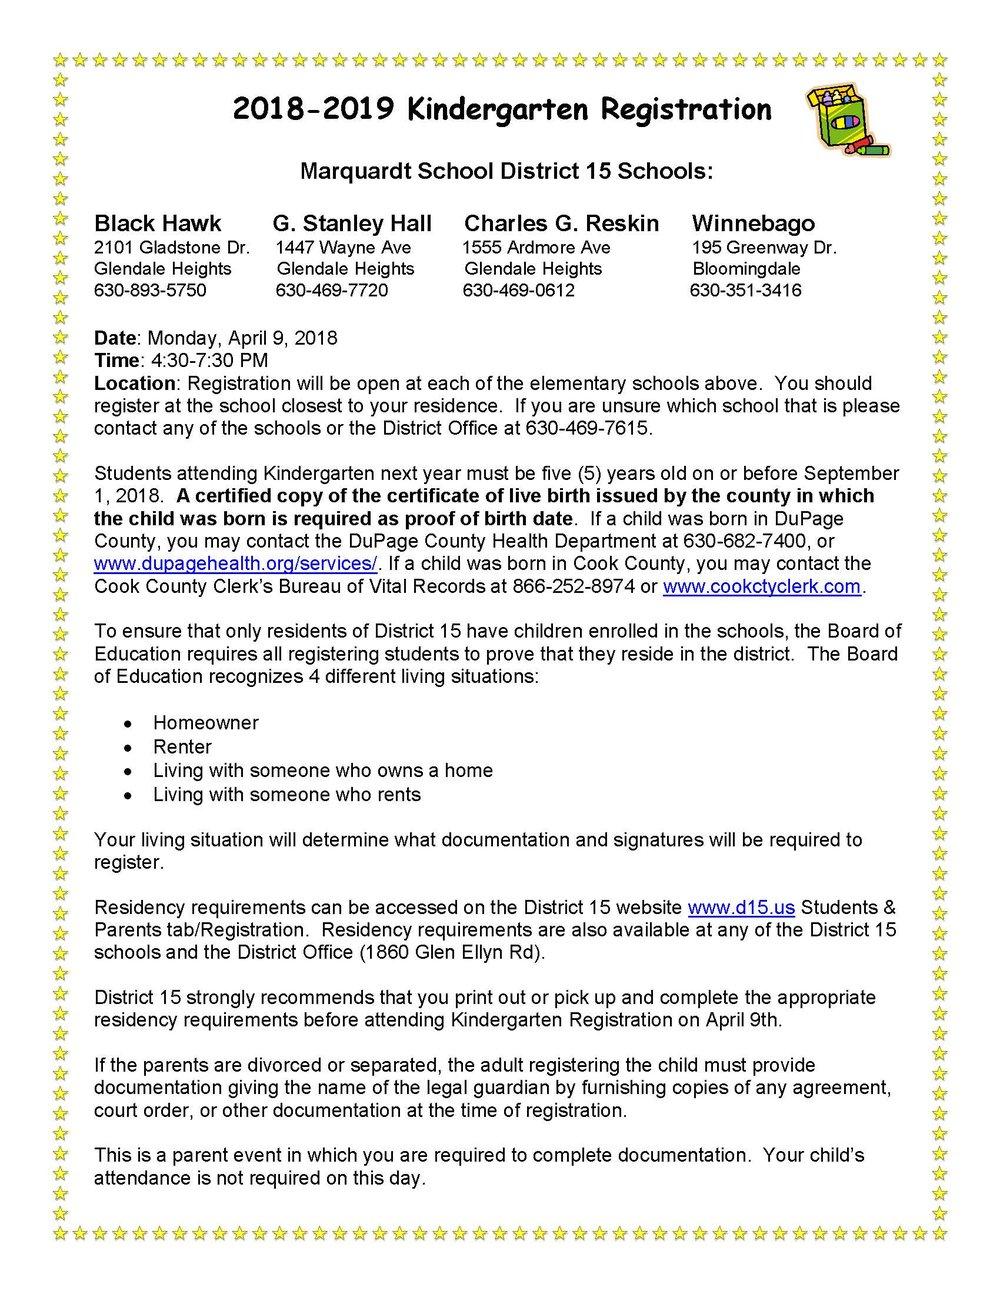 Kindergarten Flyer 2018-2019_Page_1.jpg